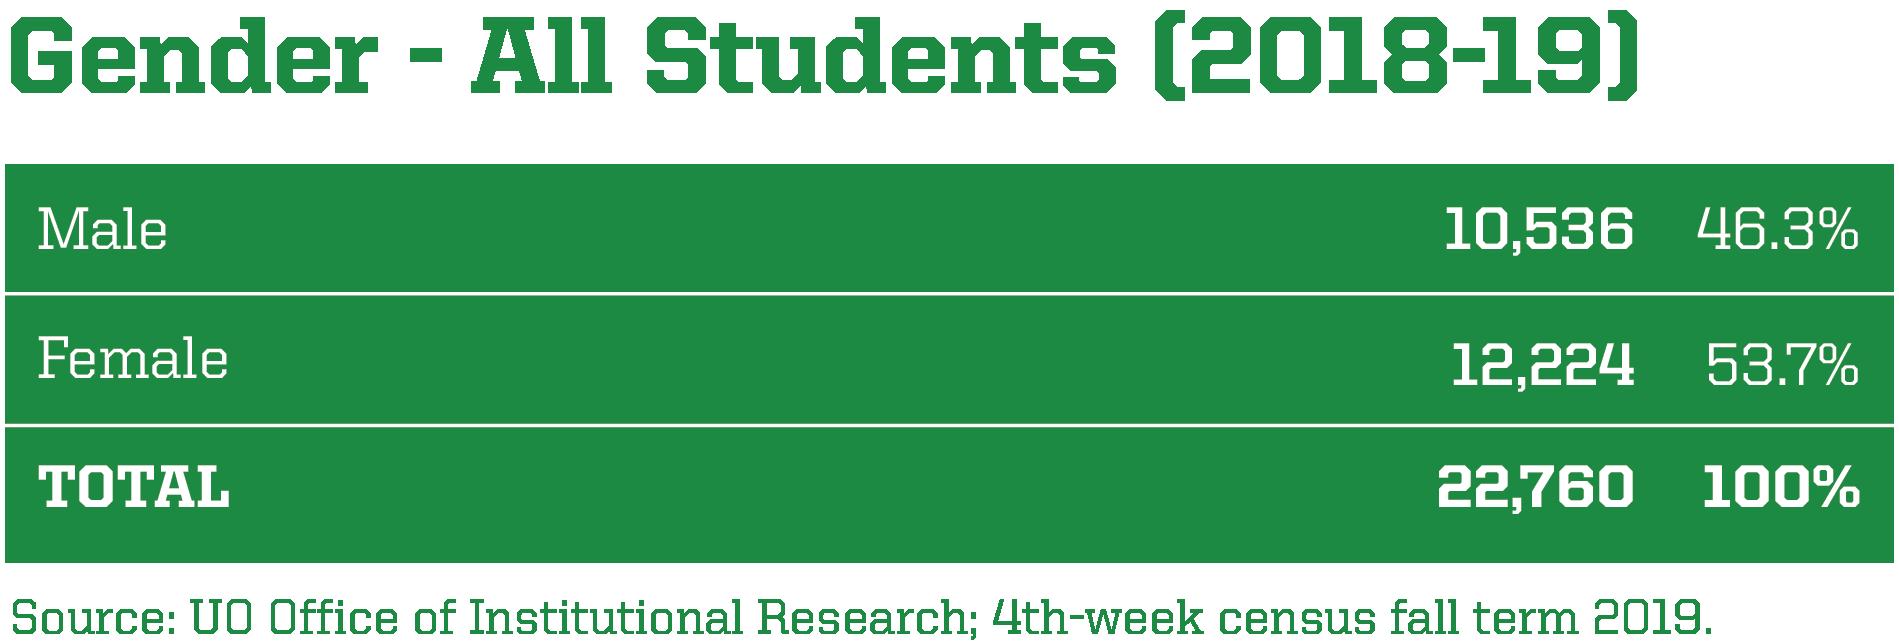 Gender Breakdown of UO Students